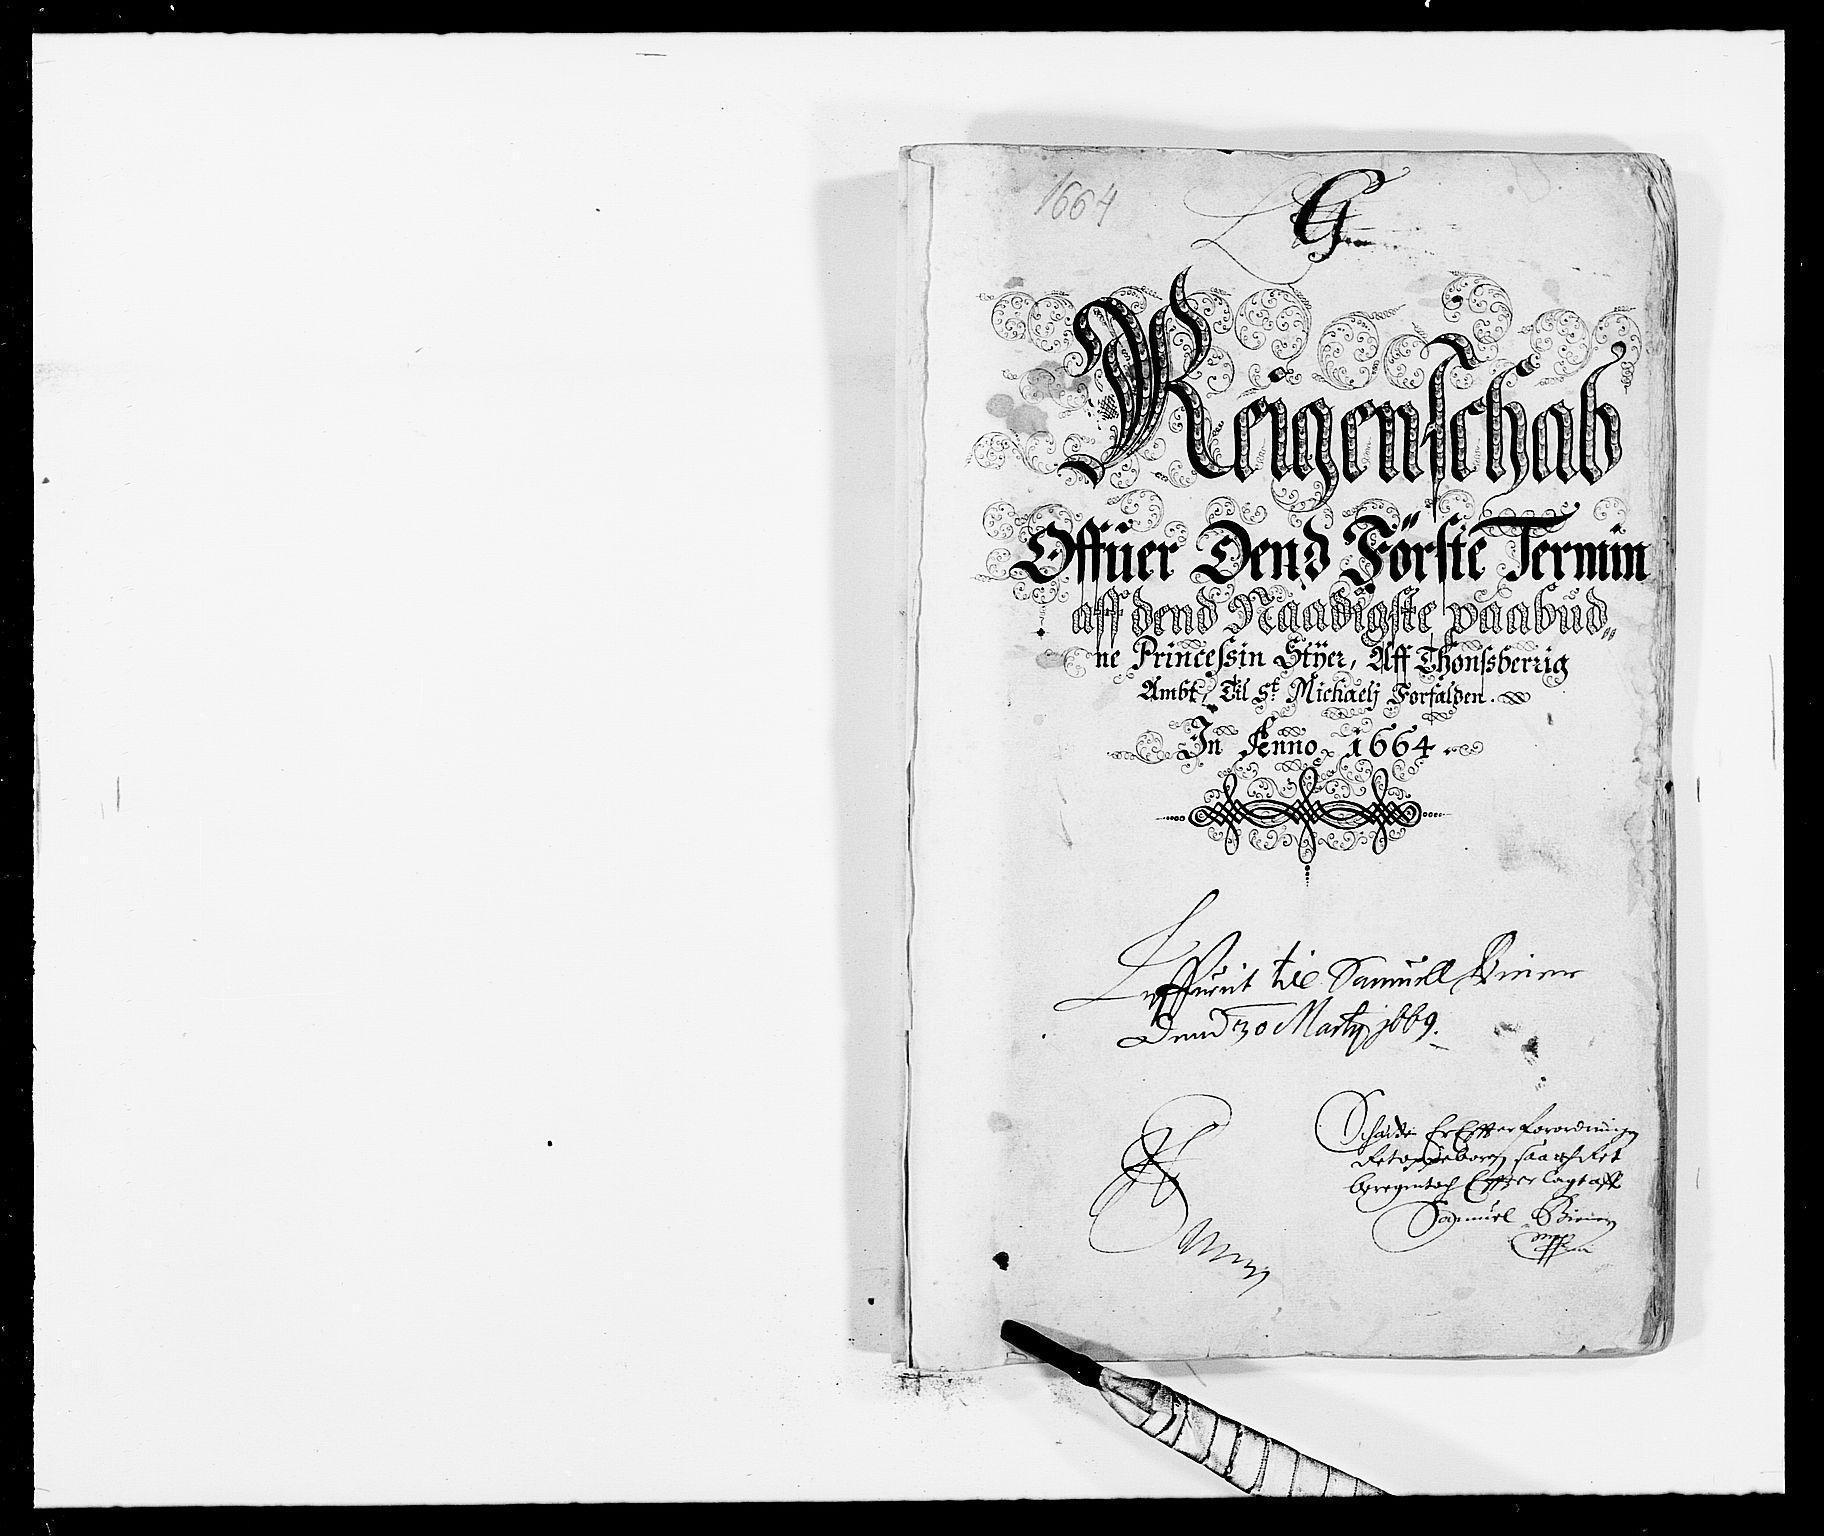 RA, Rentekammeret inntil 1814, Reviderte regnskaper, Fogderegnskap, R32/L1839: Fogderegnskap Jarlsberg grevskap, 1664-1673, s. 148